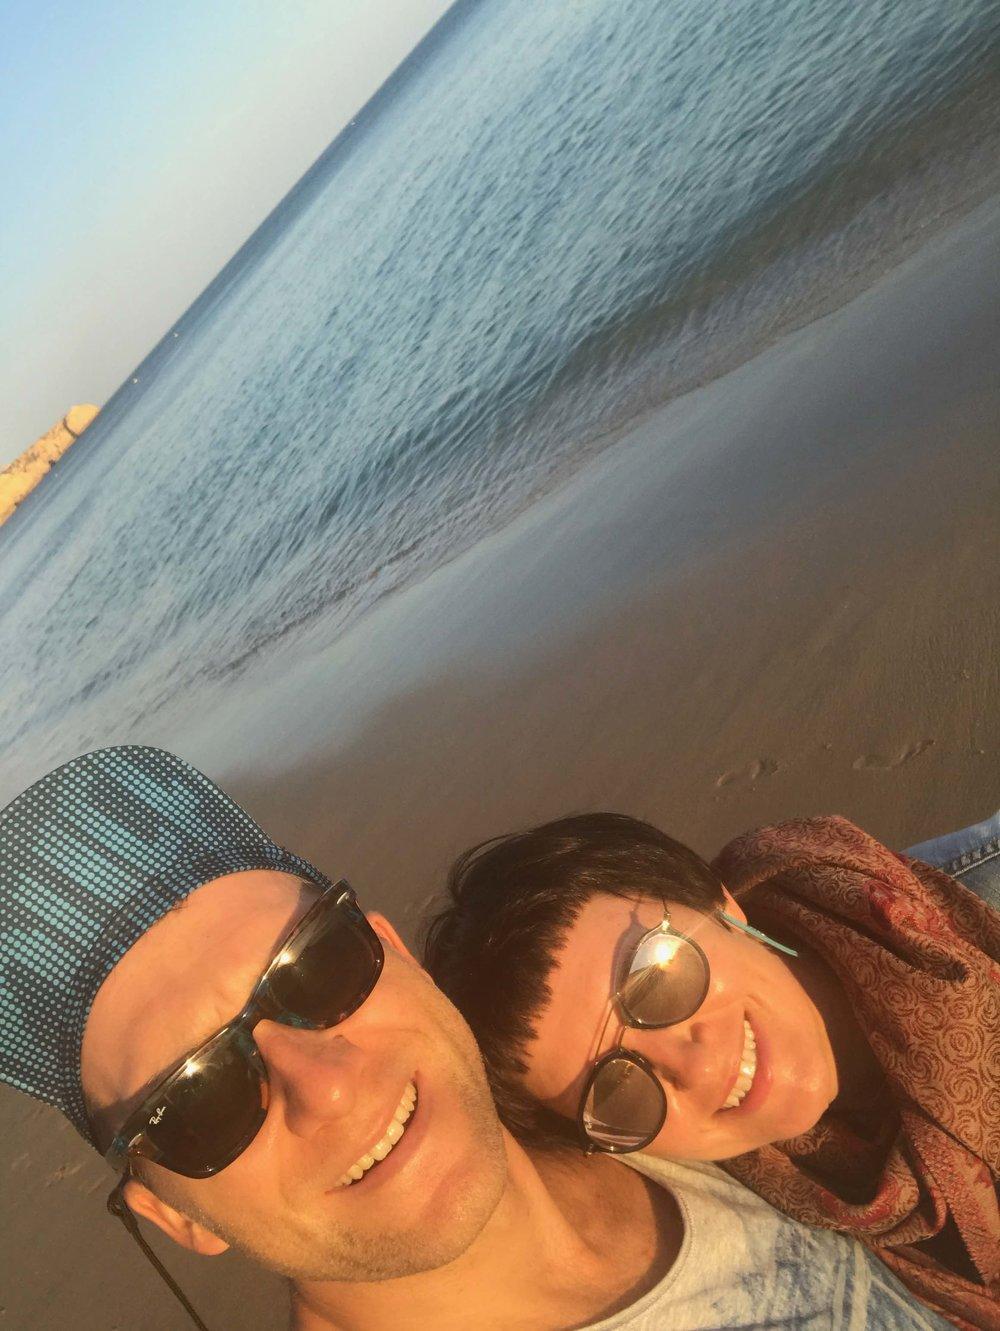 #disawistories #reiseblog #portugal #algarve #wir #portodemos #surfen.jpg